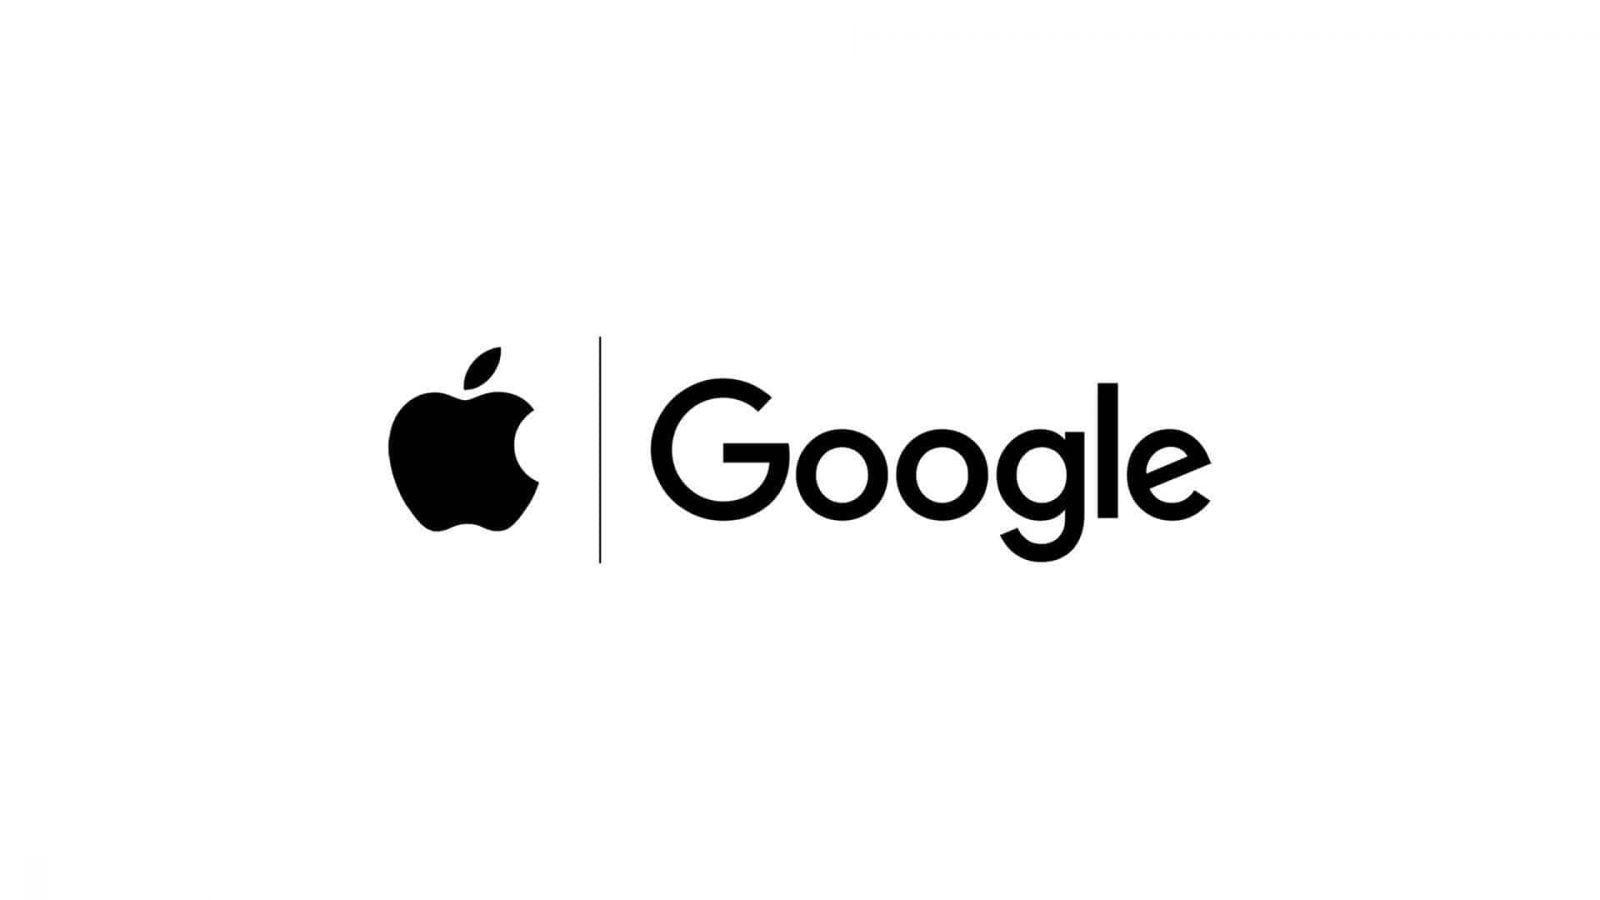 Google и Apple совместно борются с пандемией (apple google coronavirus)